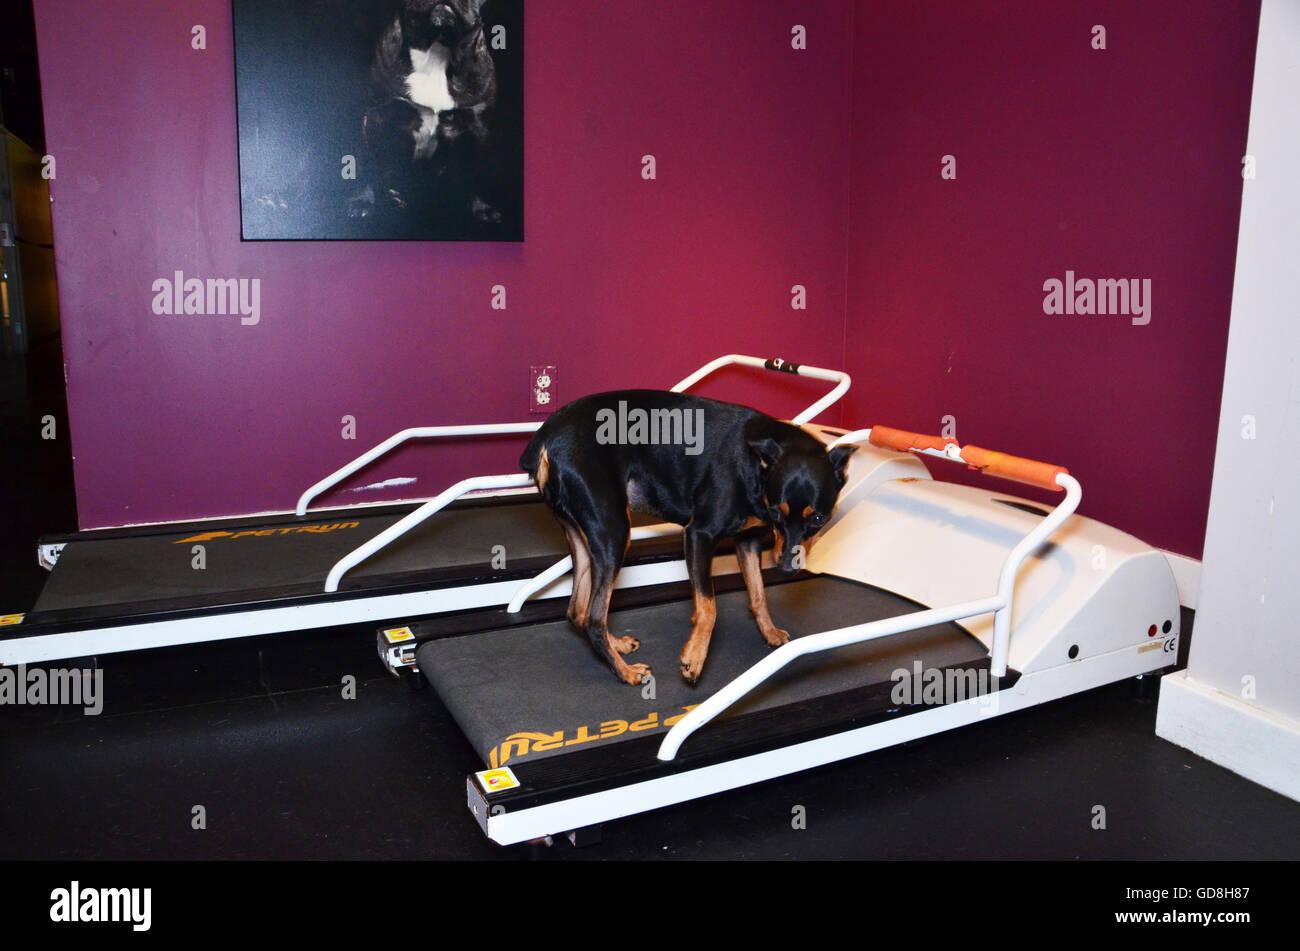 D Pet Hotels Chelsea Manhattan new york USA miniature doberman on treadmill exercise machine Stock Photo